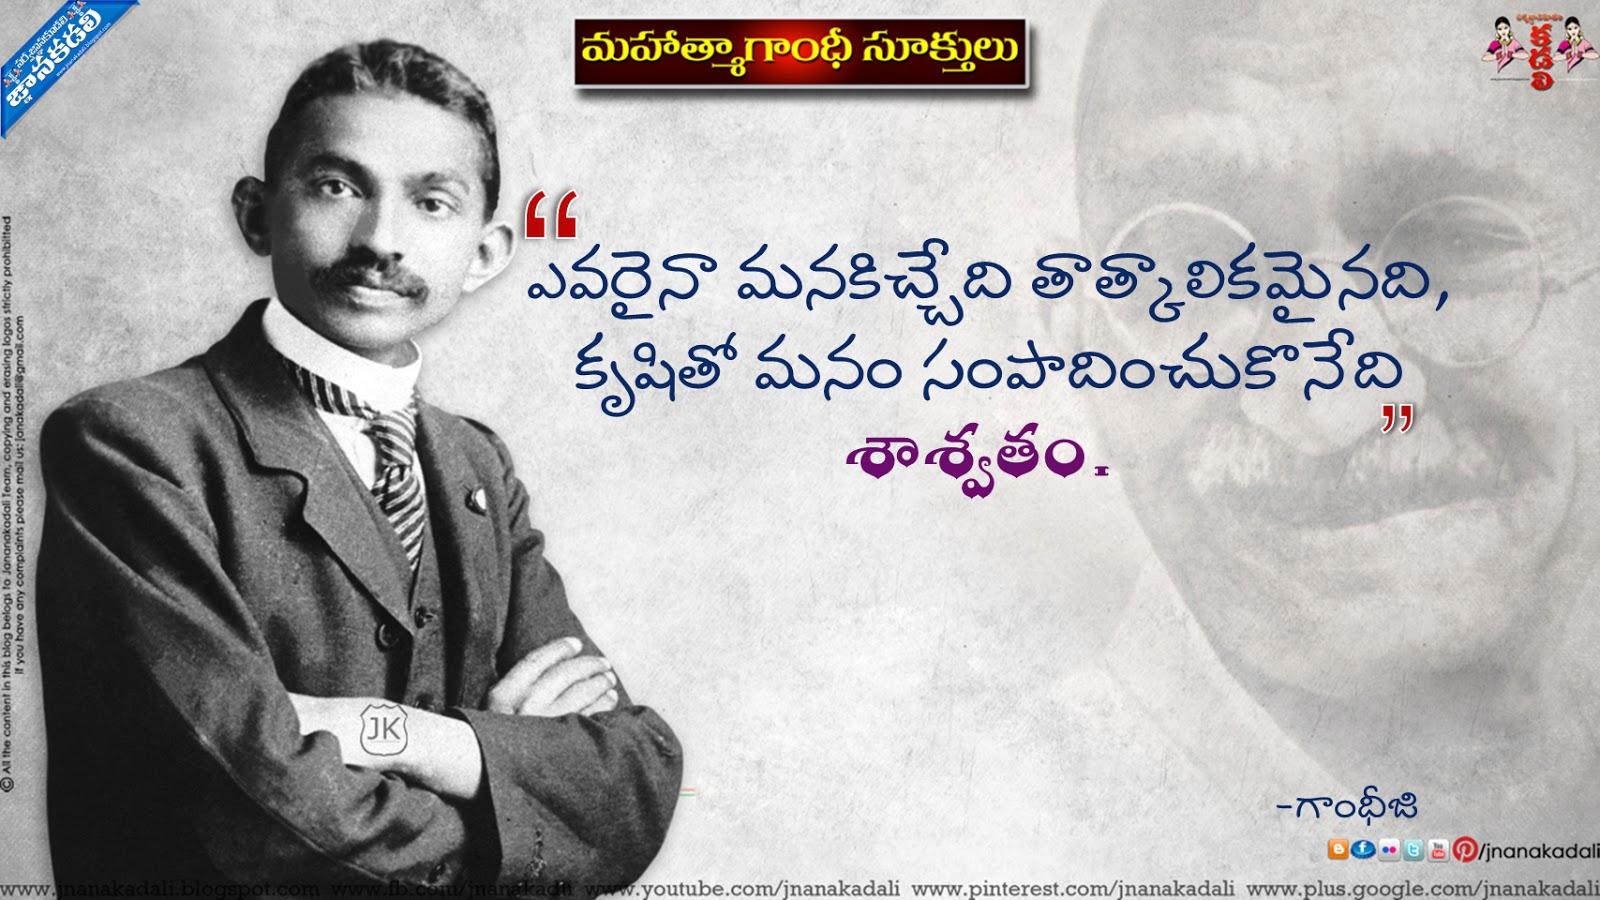 Here Is Mahatma Gandhi Inspirational Telugu Quotes - Happy Birthday Gandhi Ji - HD Wallpaper